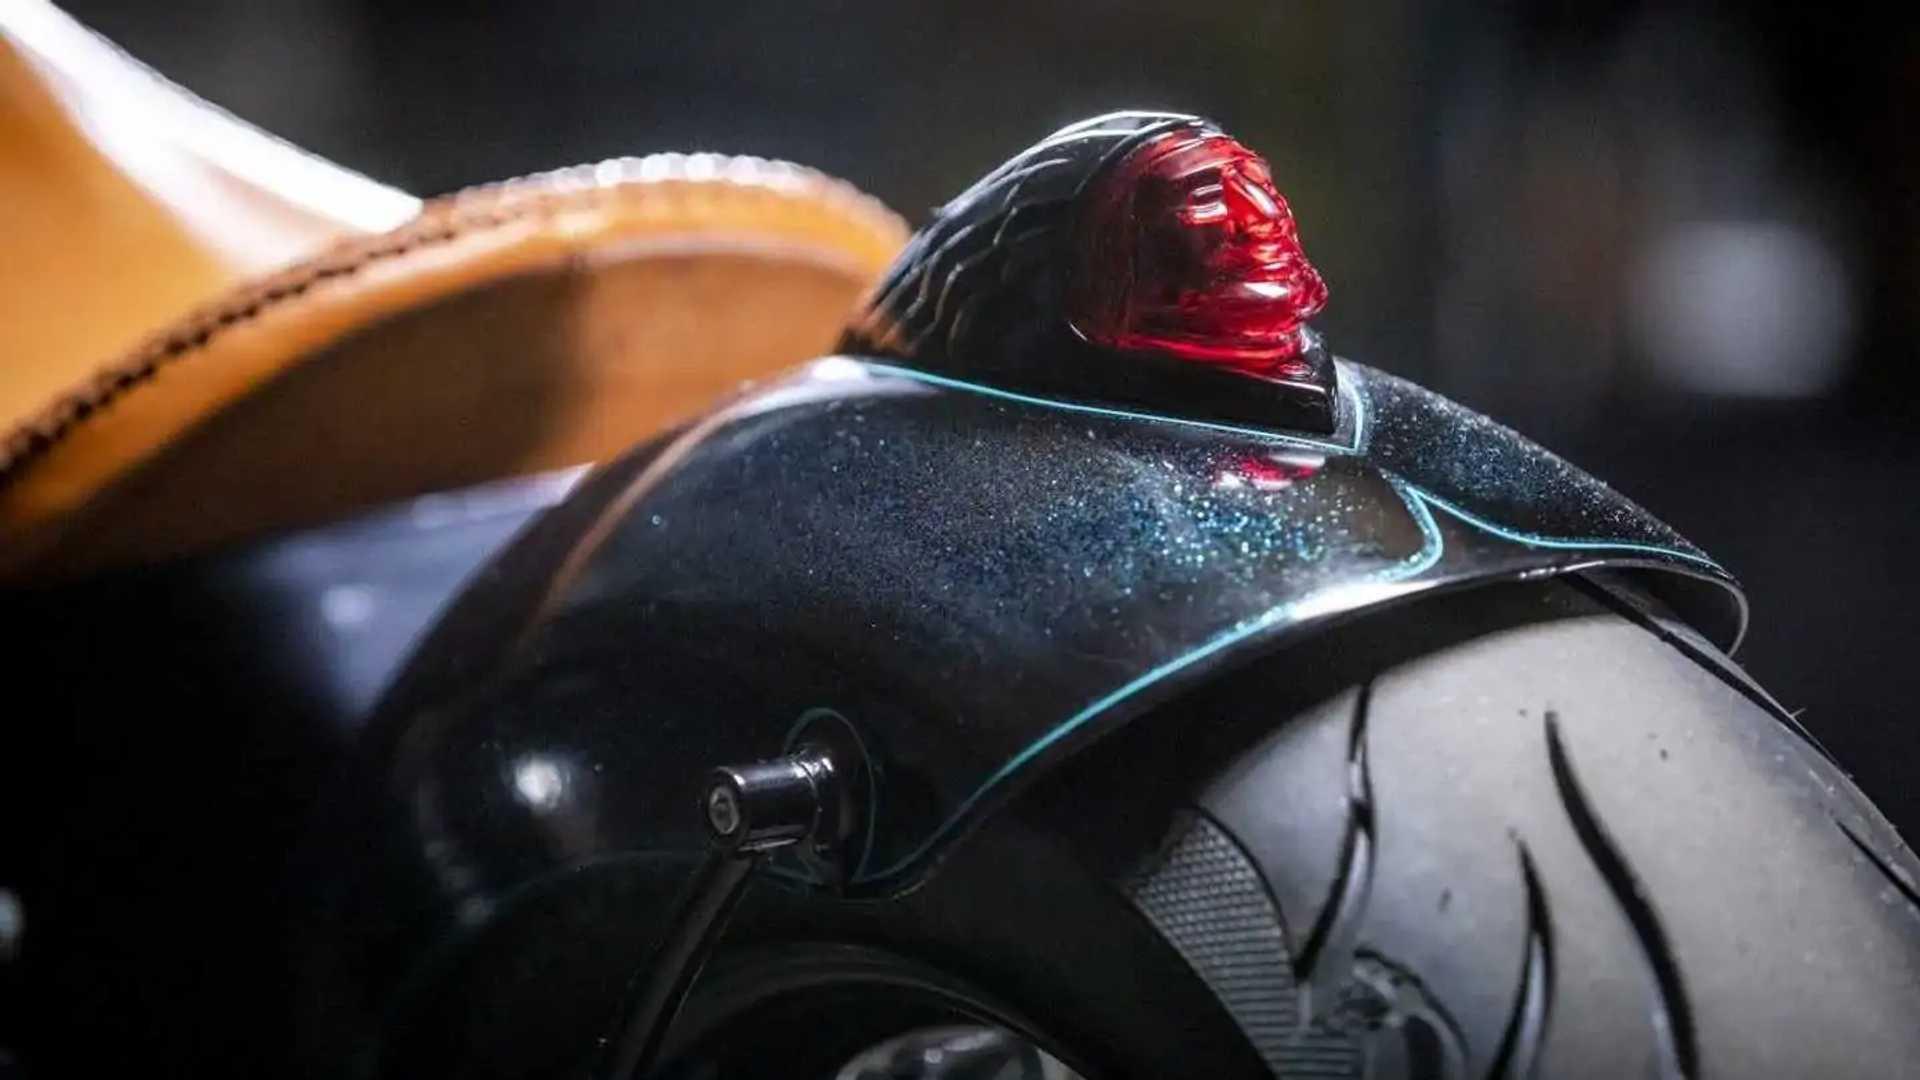 Cox-Keino Indian Chief: 2022 Indian Chief Dark Horse - Taillight